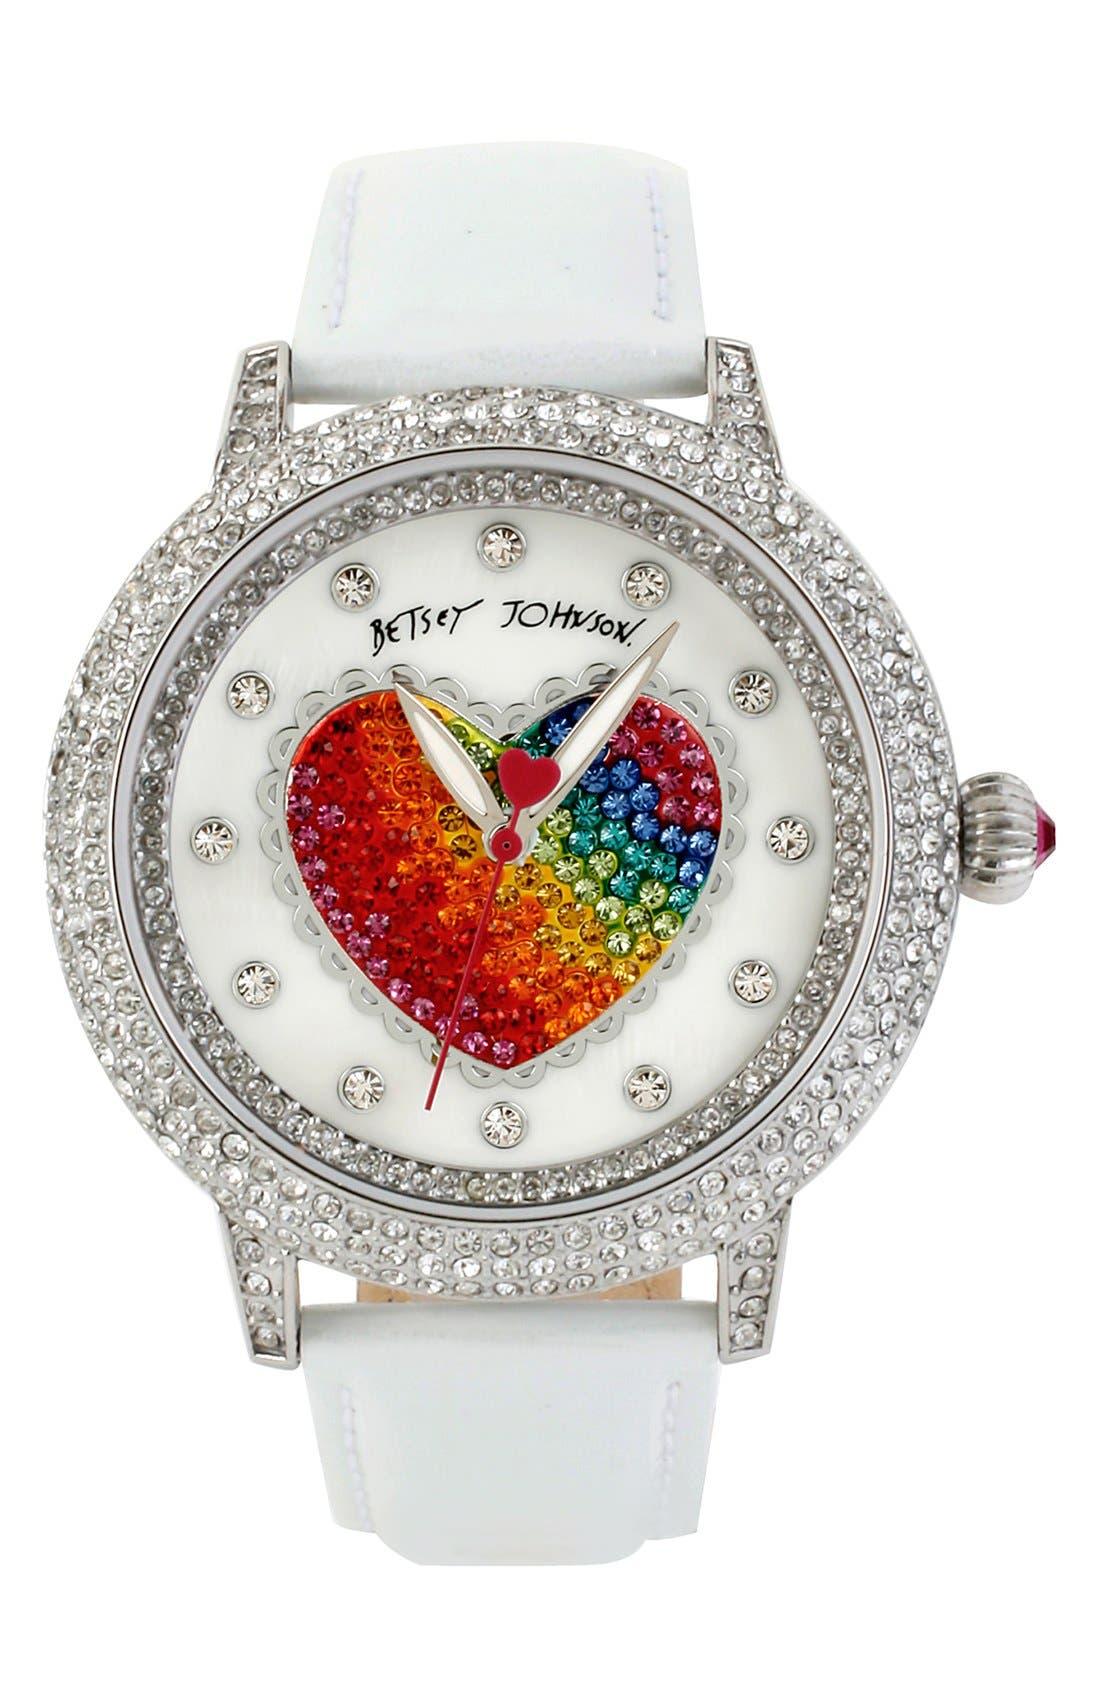 Main Image - Betsey Johnson Heart Dial Crystal Bezel Watch, 46mm